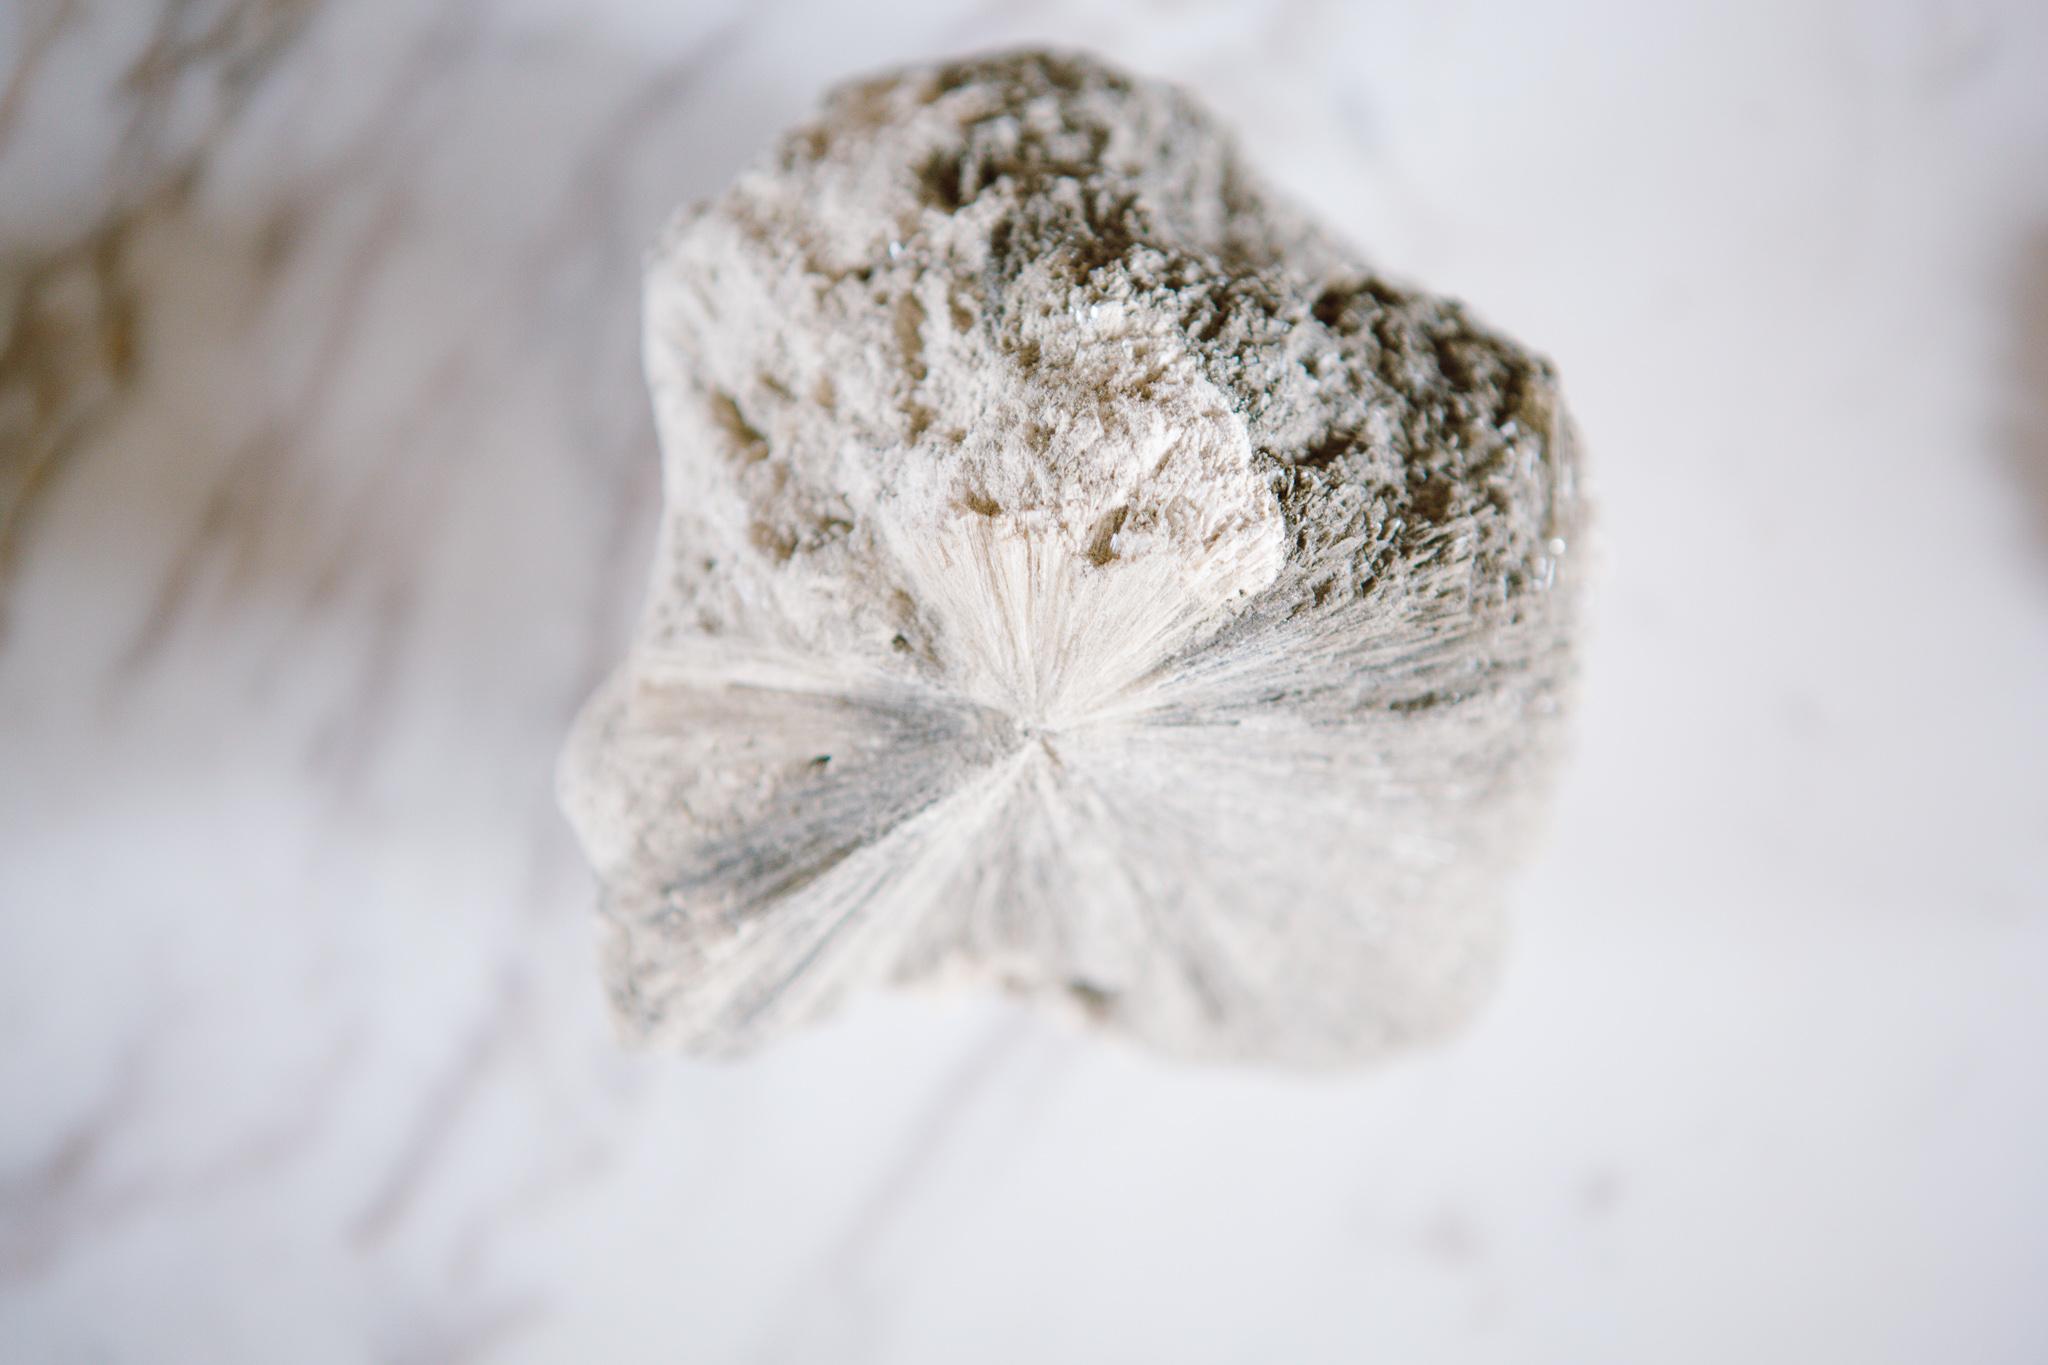 Akanwu (Potassium Carbonate)